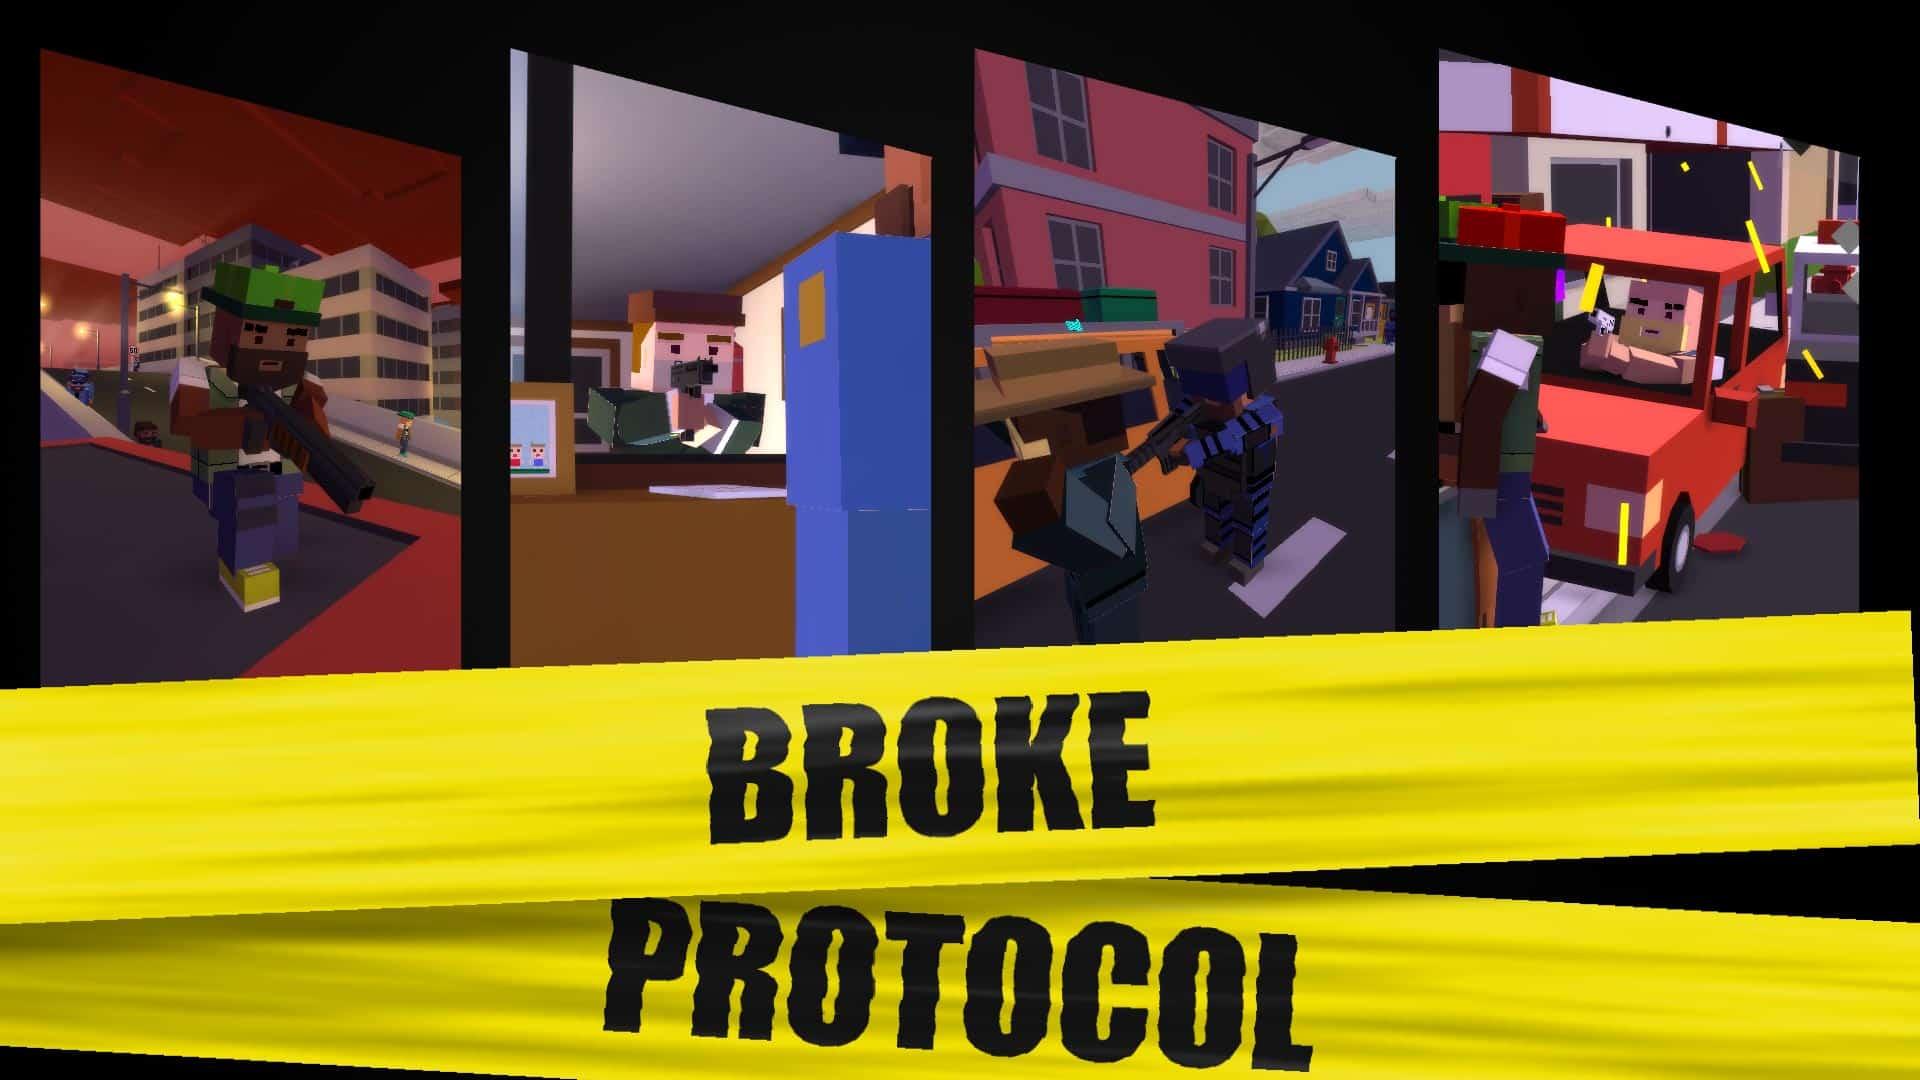 broke-protocol-header-image